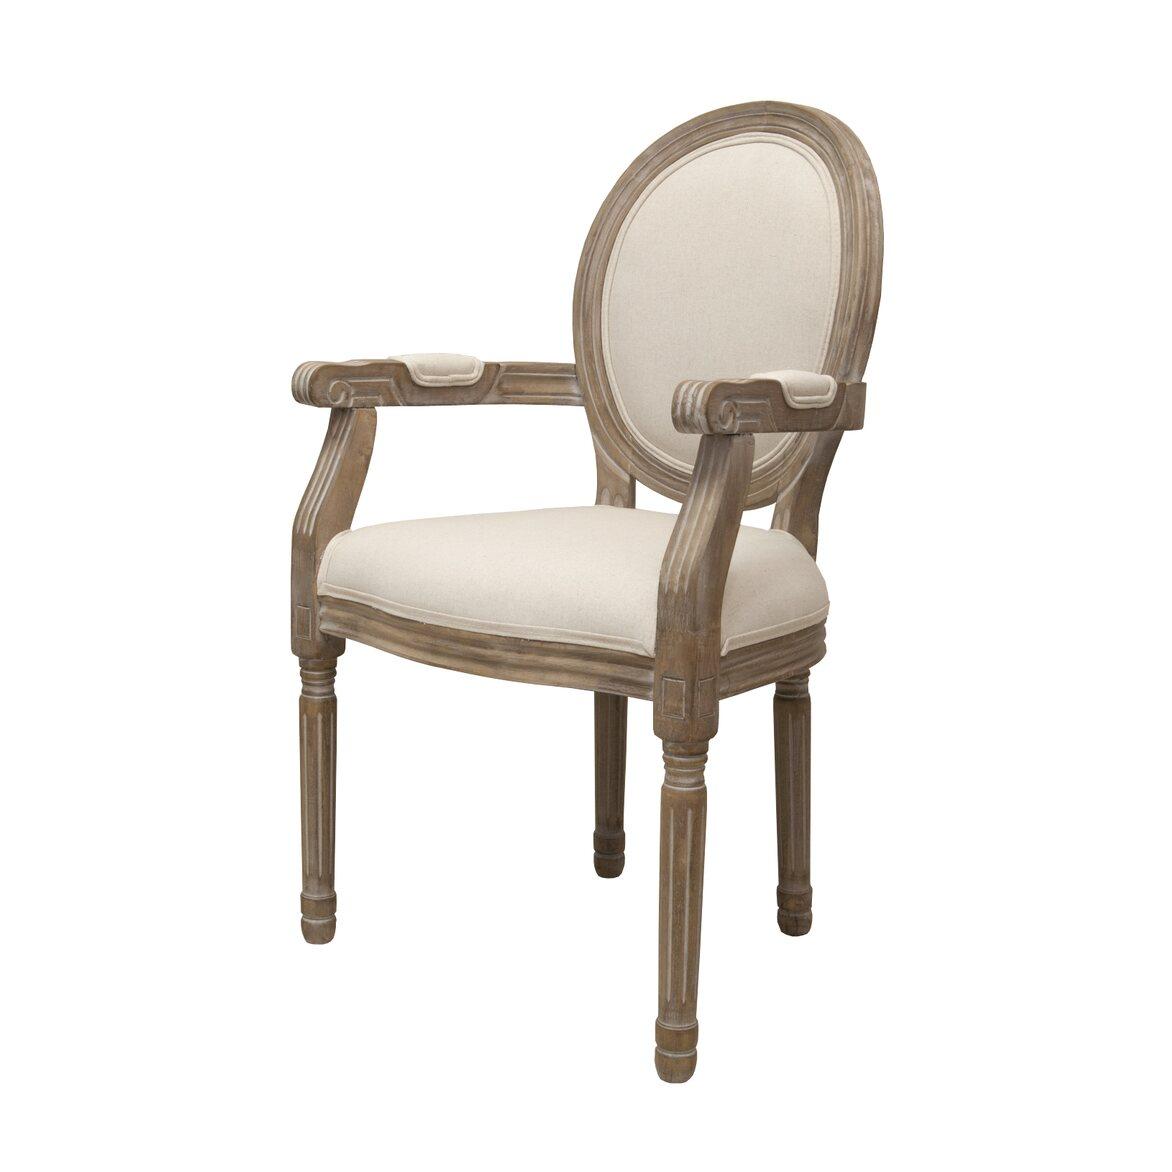 Стул Volker arm beige 4 | Обеденные стулья Kingsby